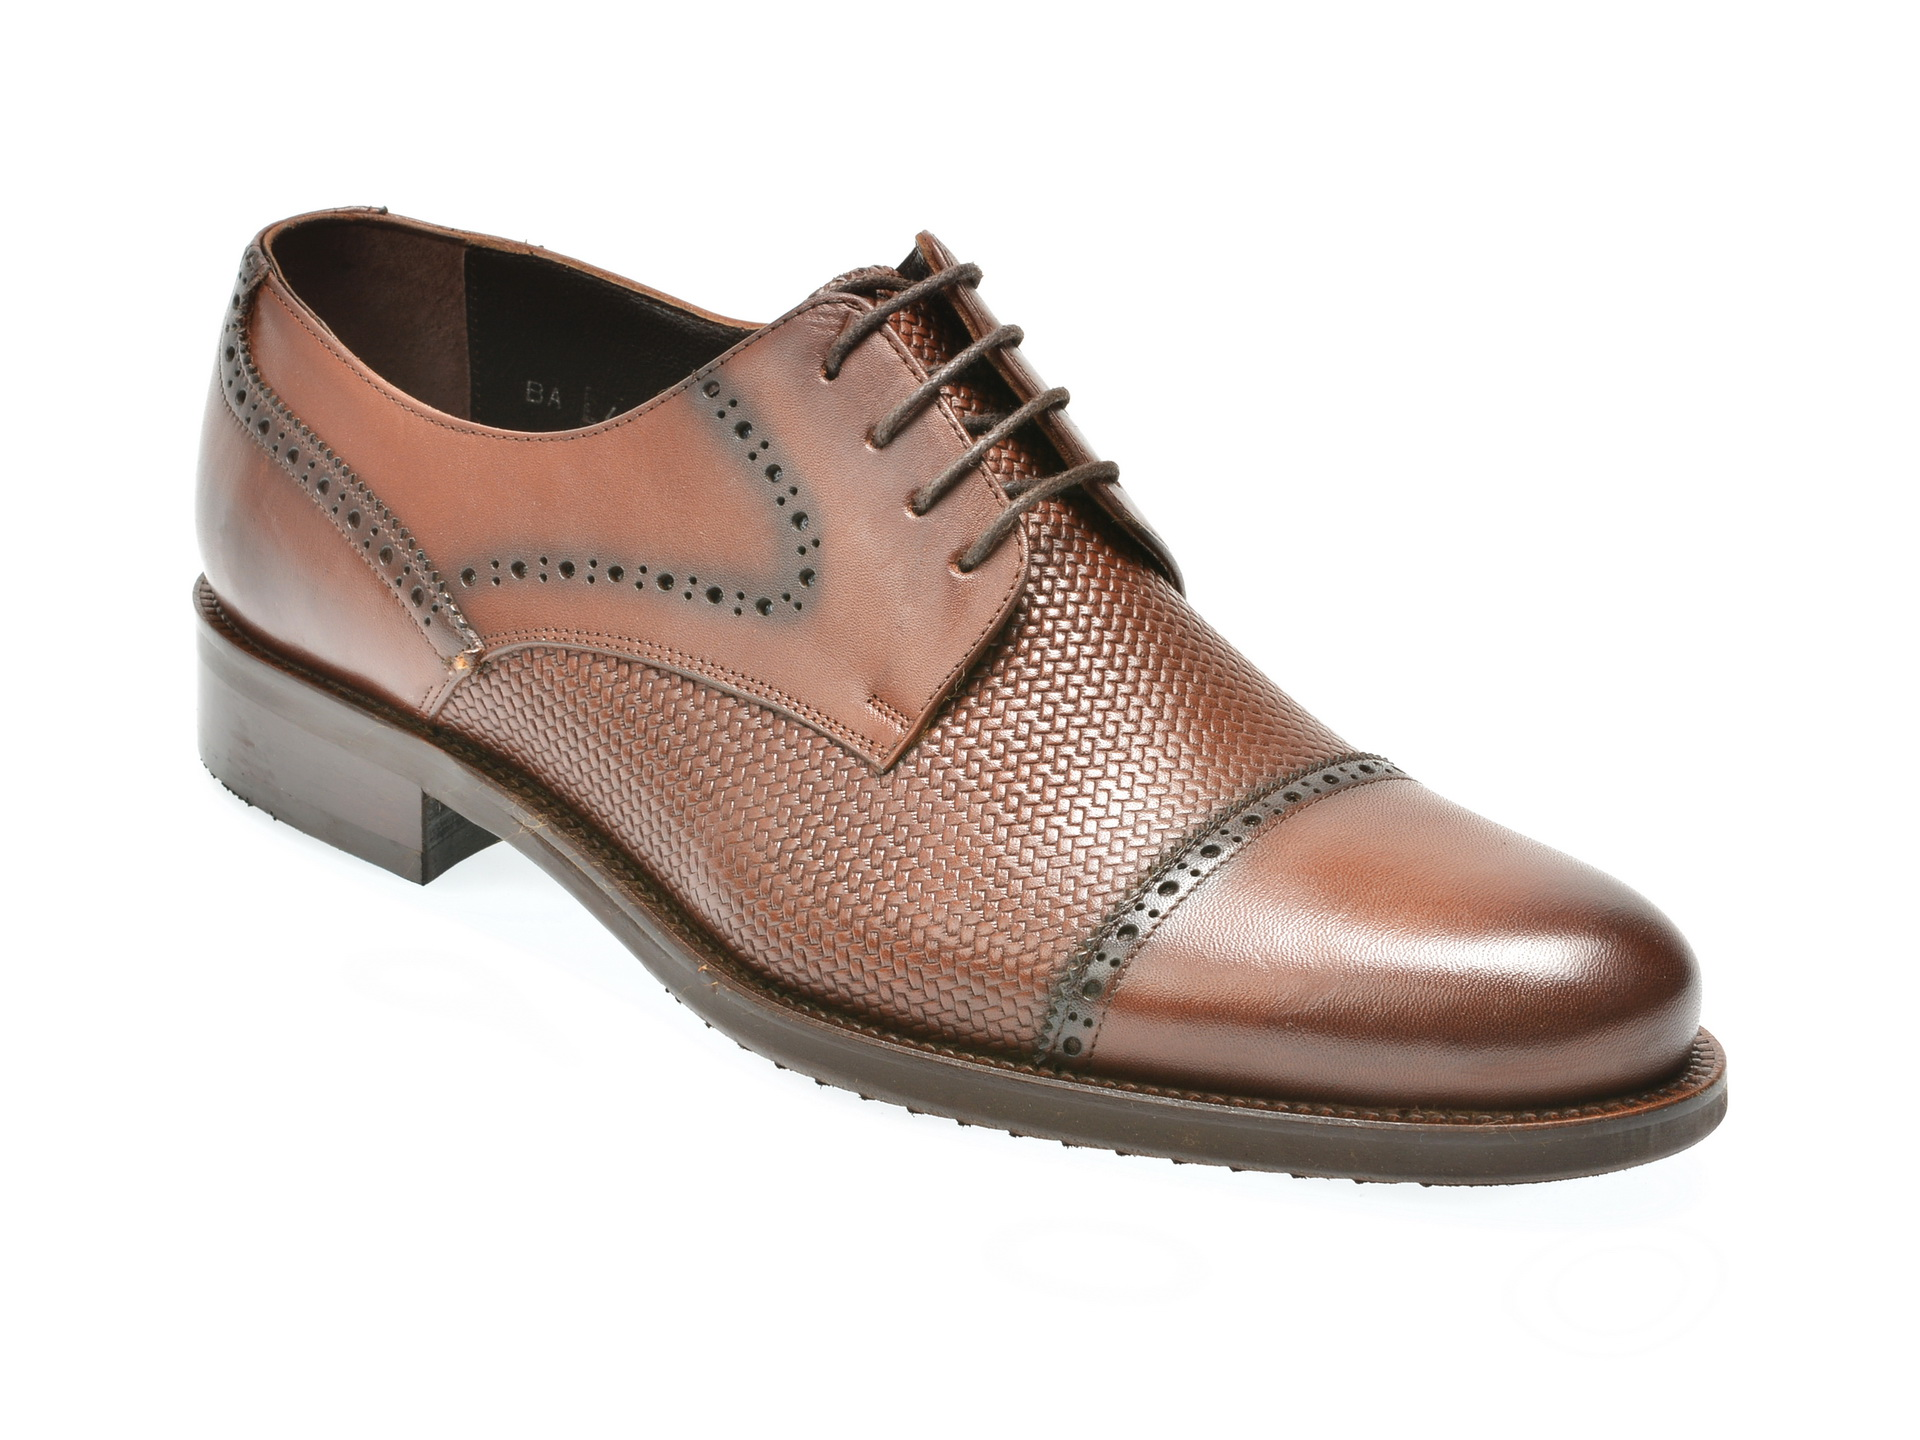 Pantofi OTTER maro, 180, din piele naturala